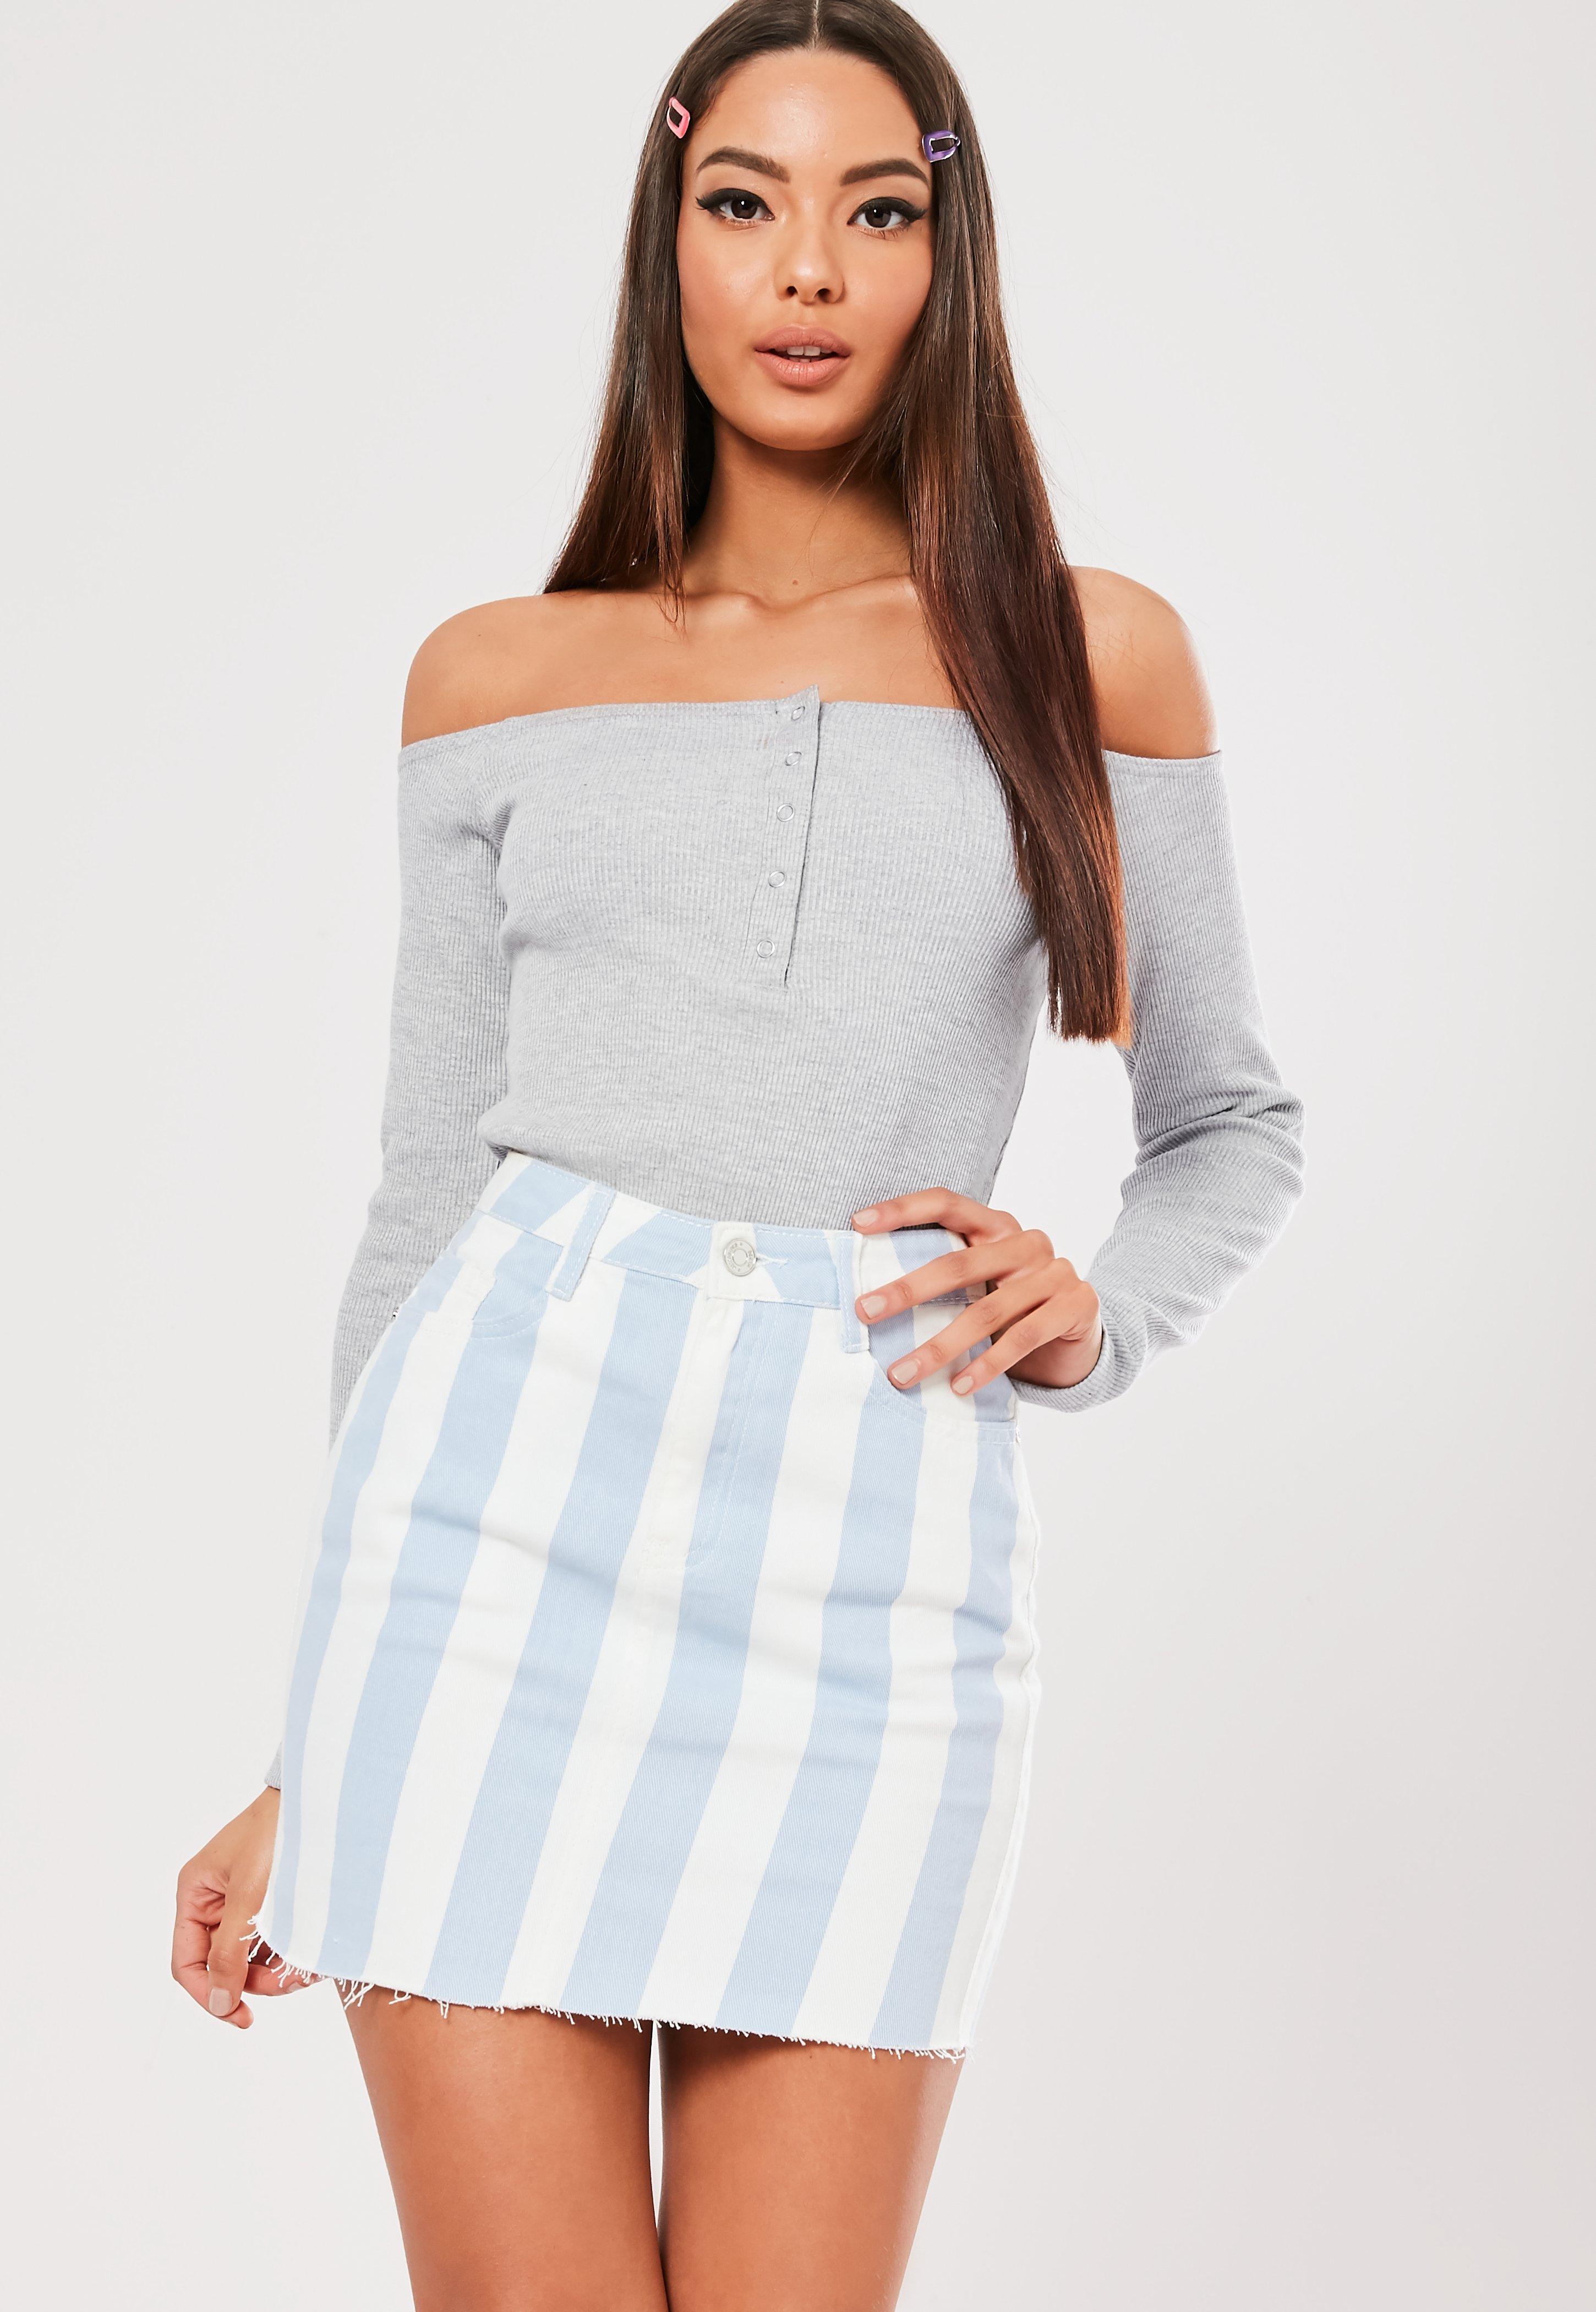 221ca2a1493 Cheap Clothes Online - Women s Sale Clothing